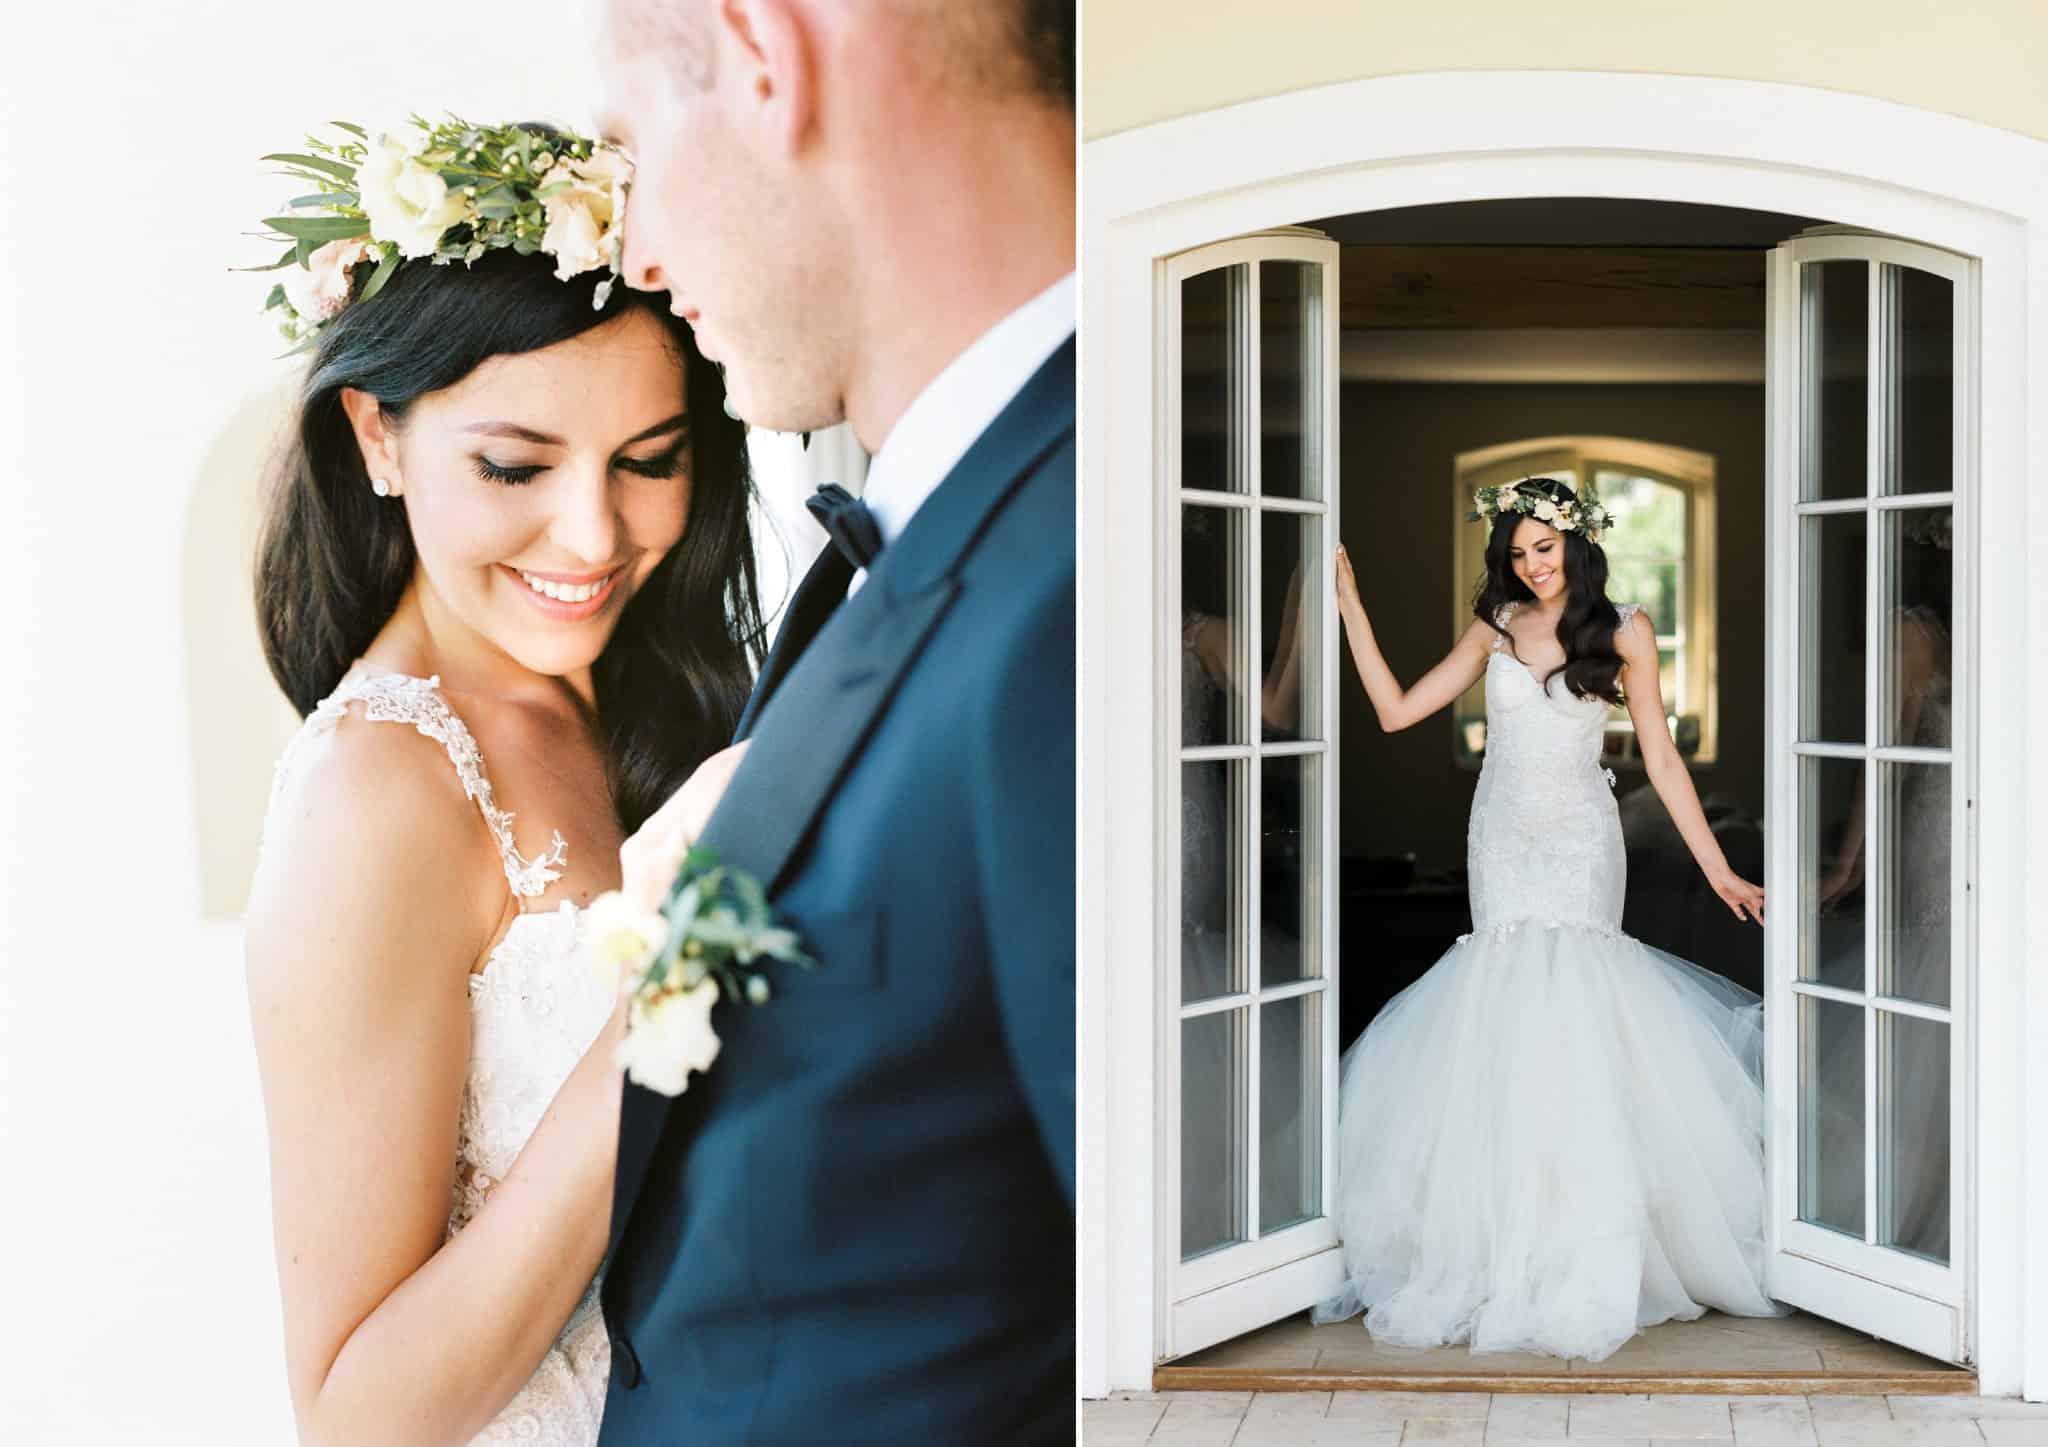 Wedoverhills_Prewedding_Film_Photographer_Vineyard_Wedding_0025